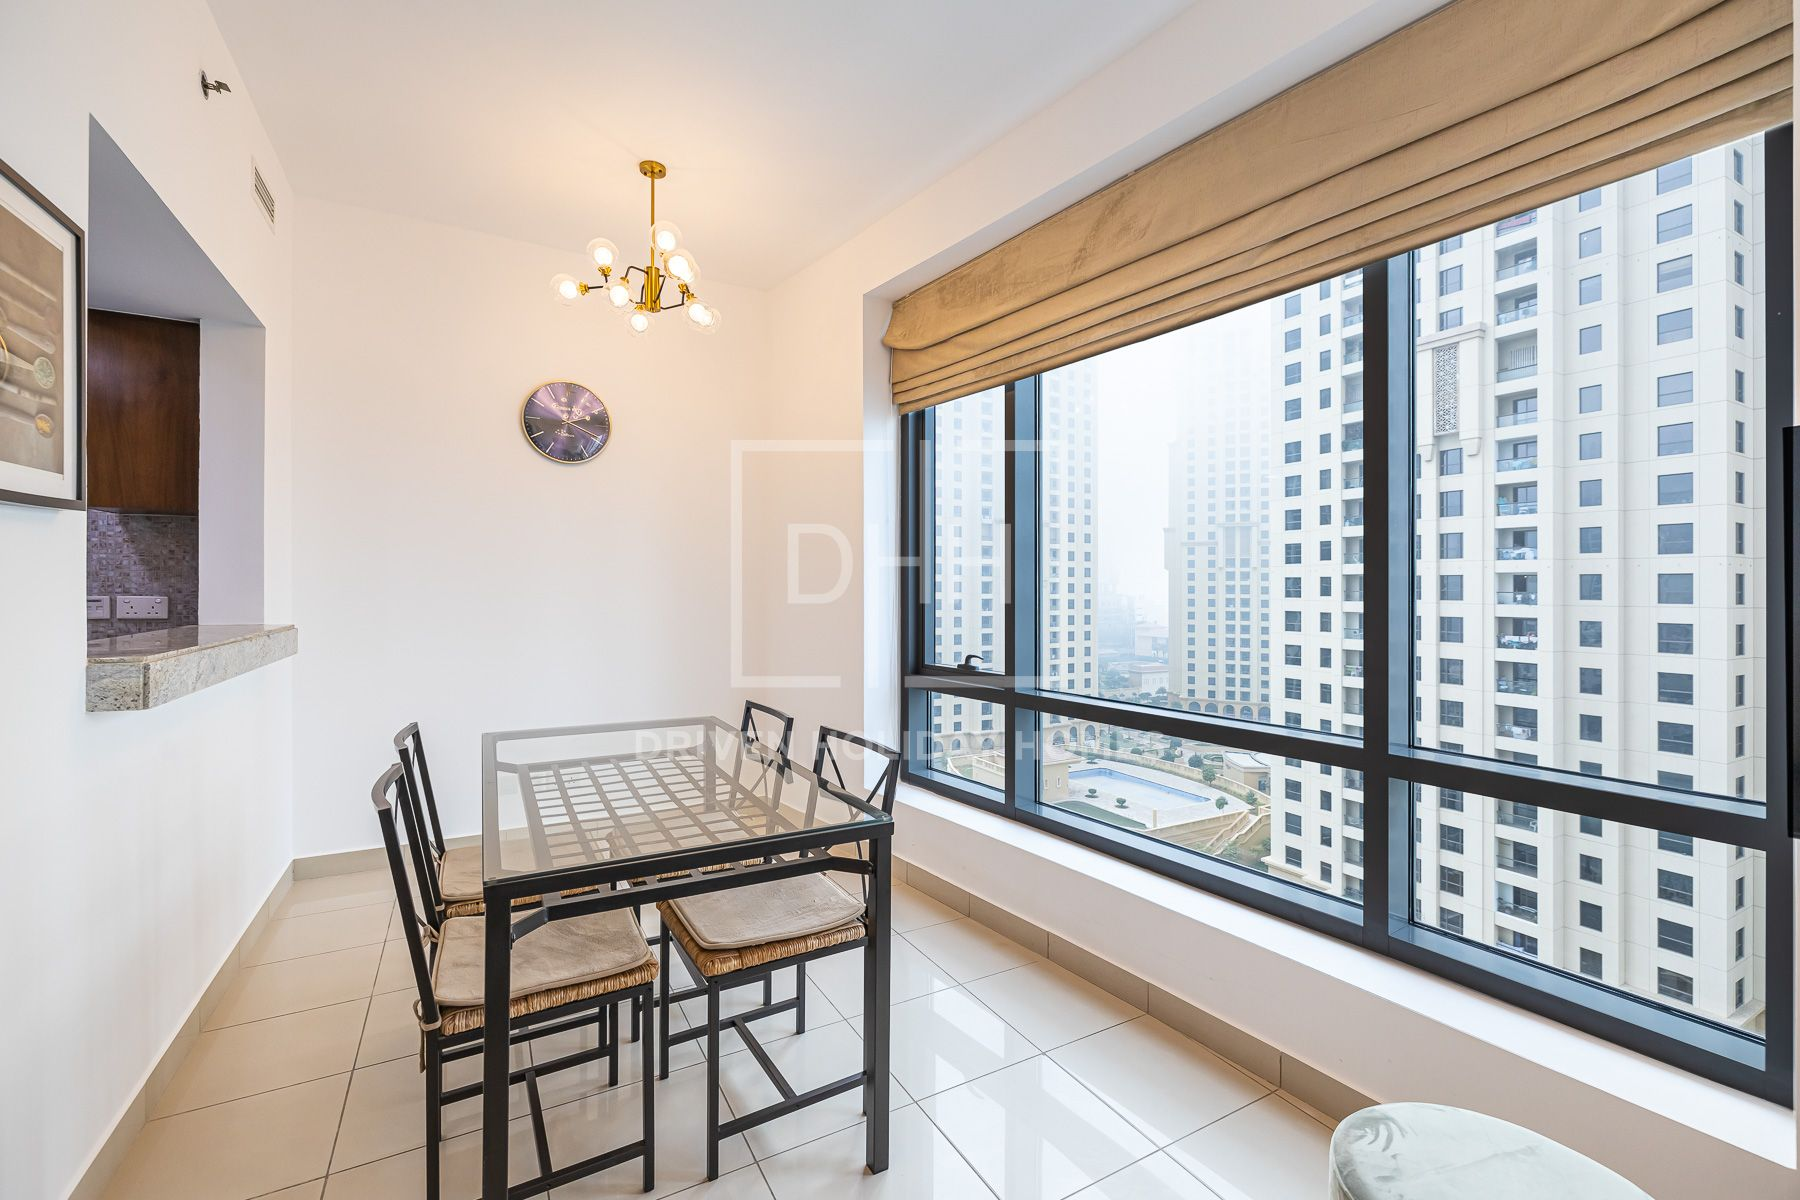 Apartment for Rent in Sanibel Tower - Dubai Marina